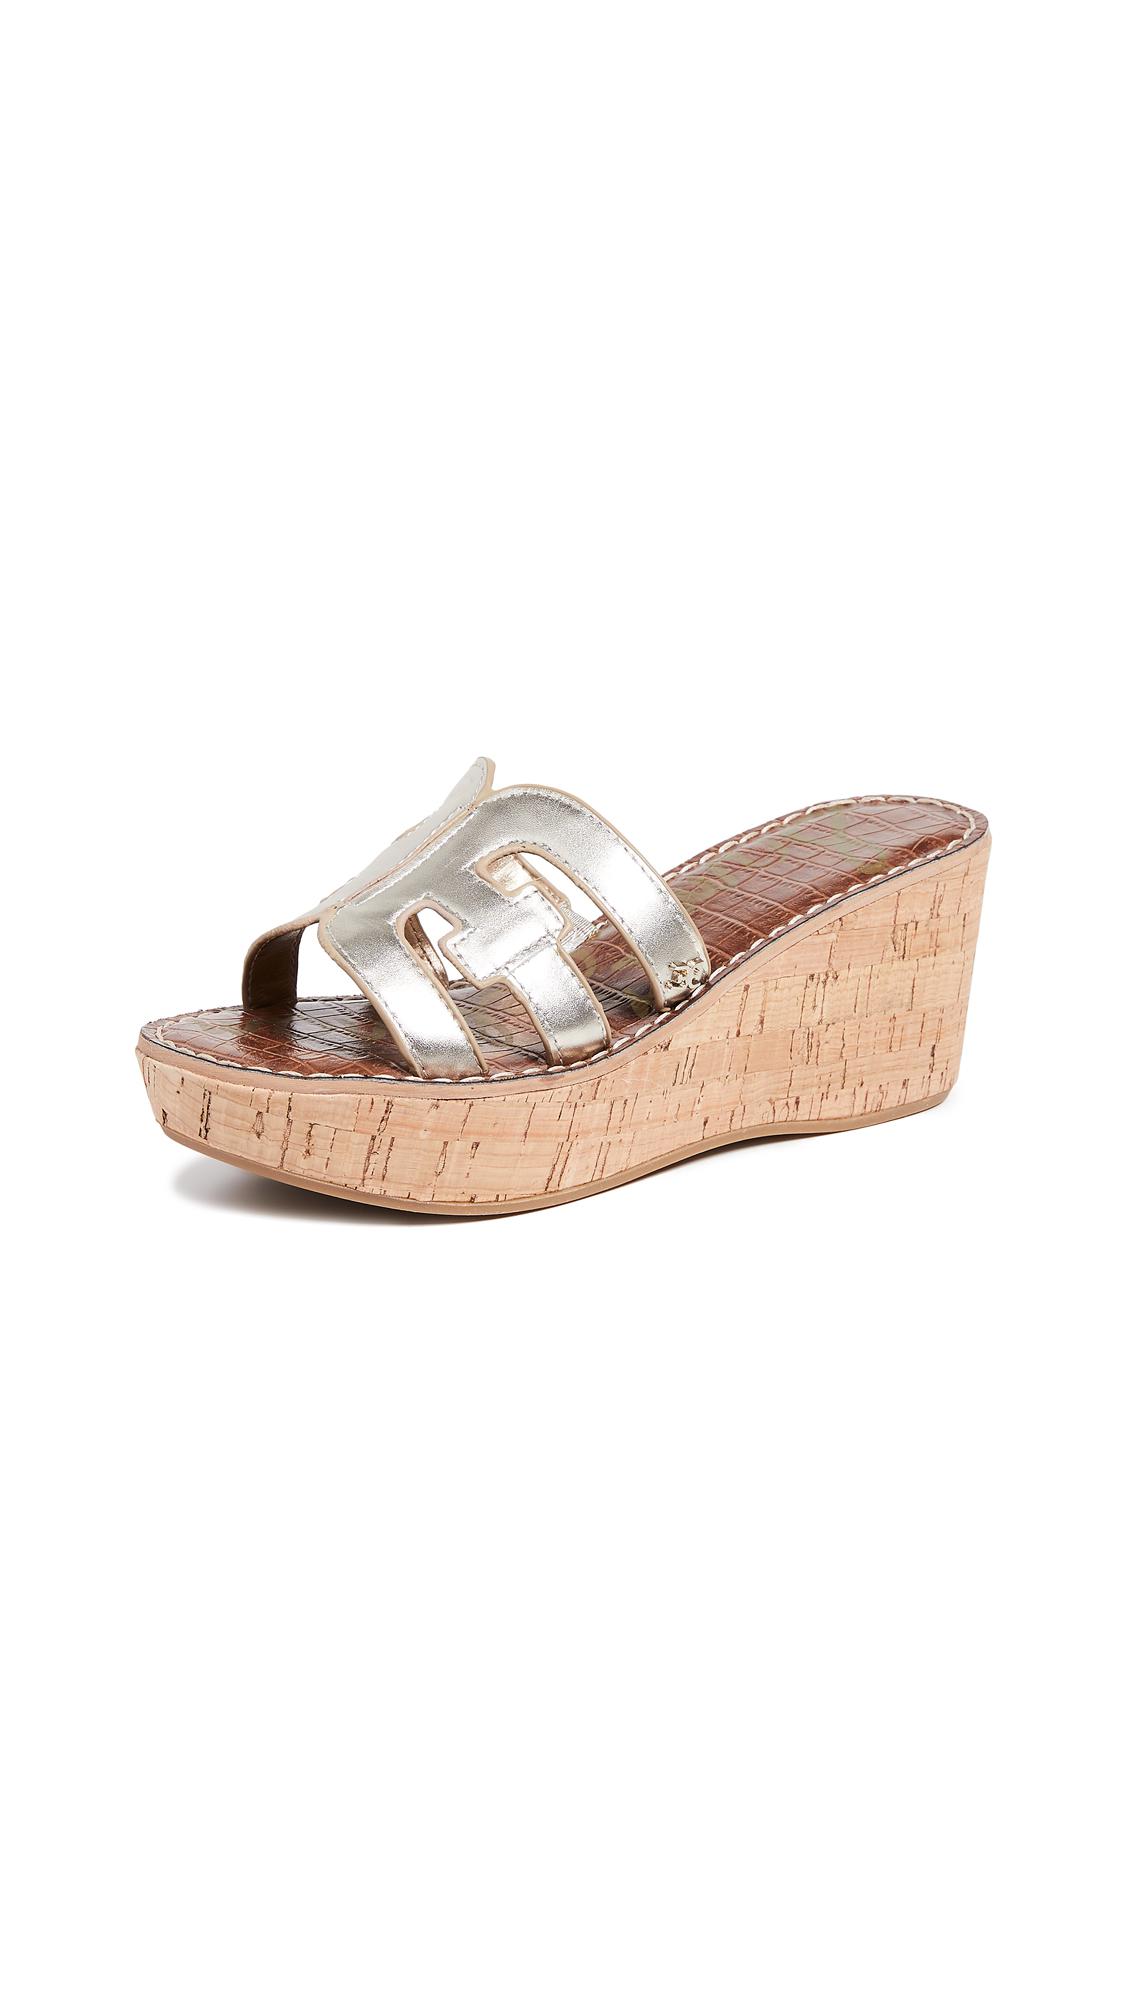 Sam Edelman Regis Wedge Sandals